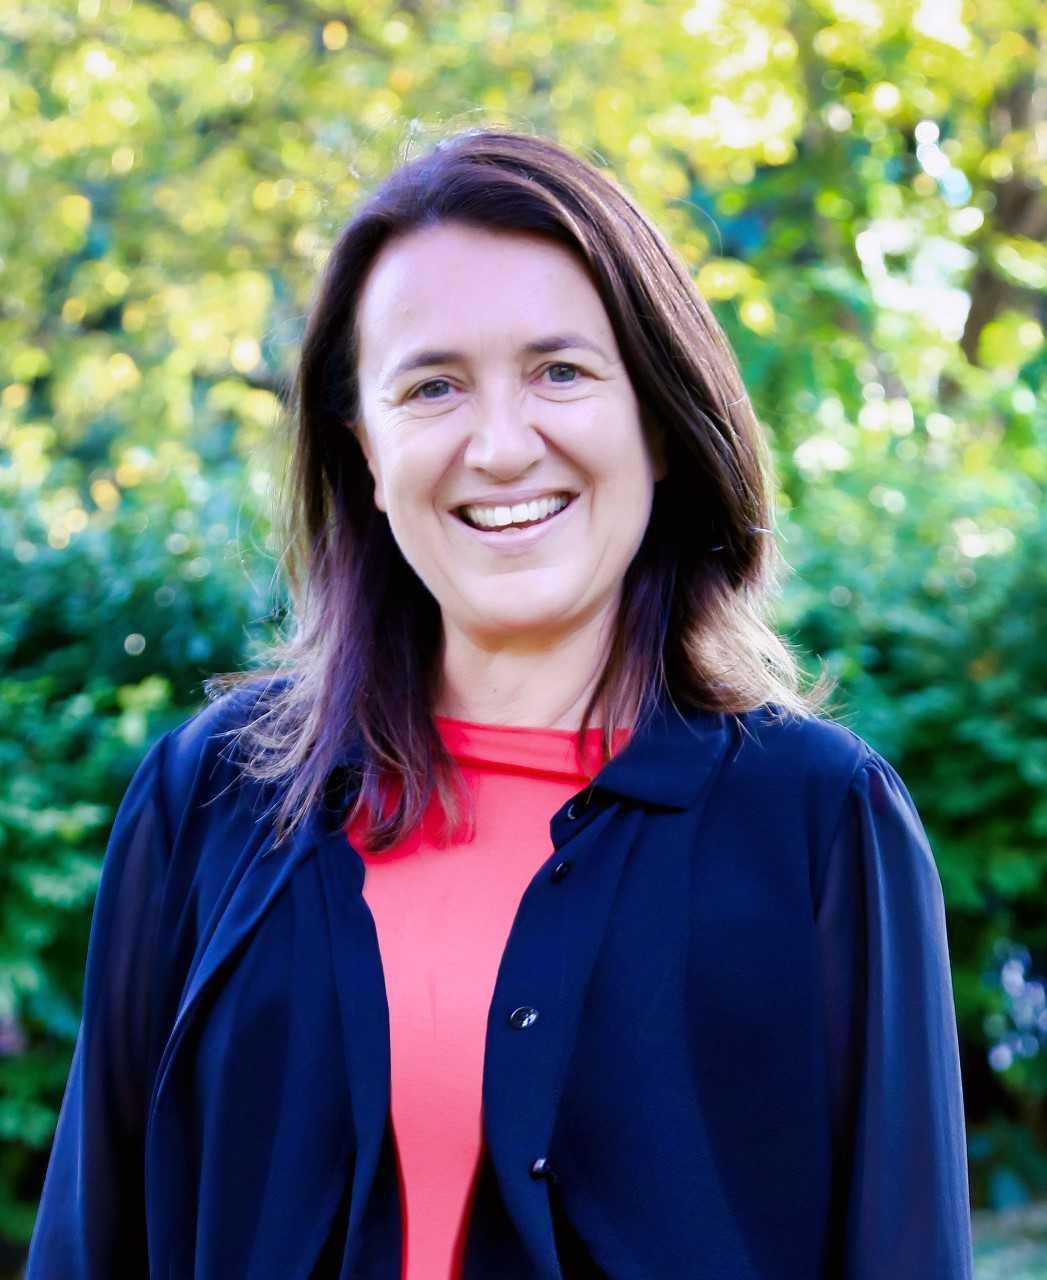 Monika Langthaler-Rosenberg